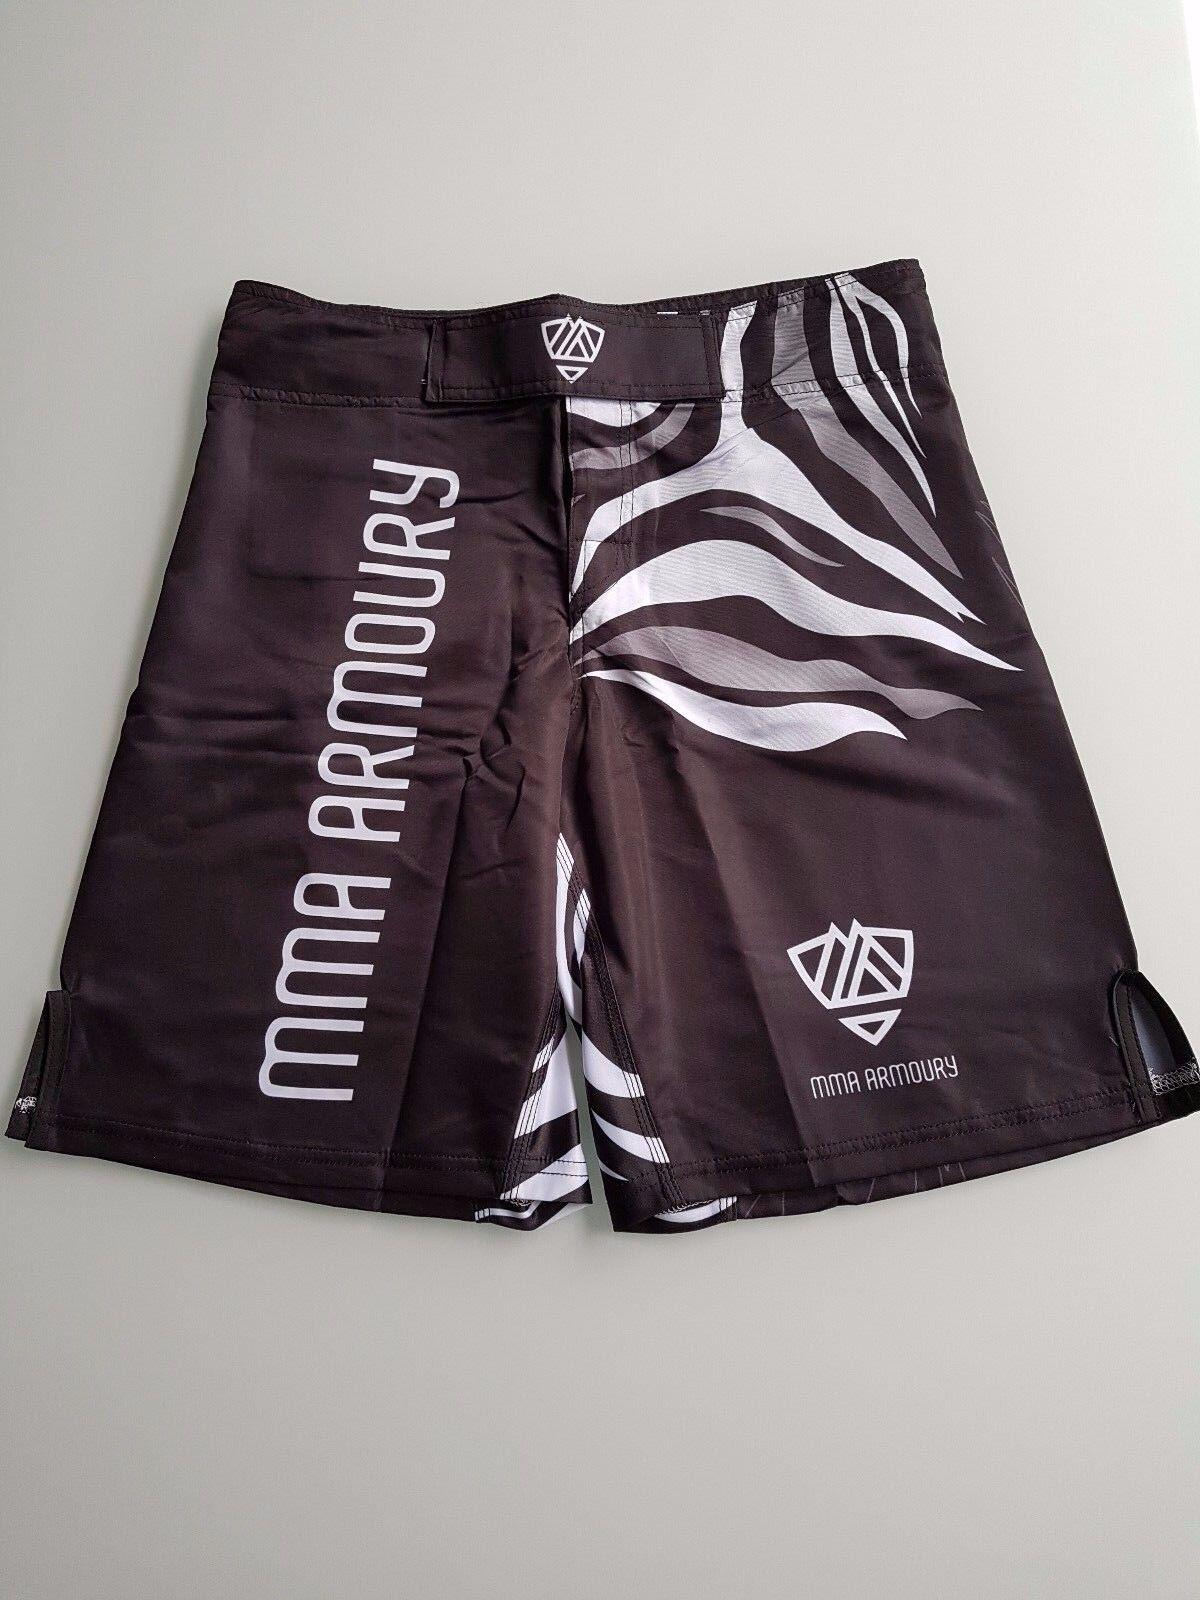 MMA,BJJ, Jui Jitsu, No Gi - Tiger Stripes Shorts - Kids